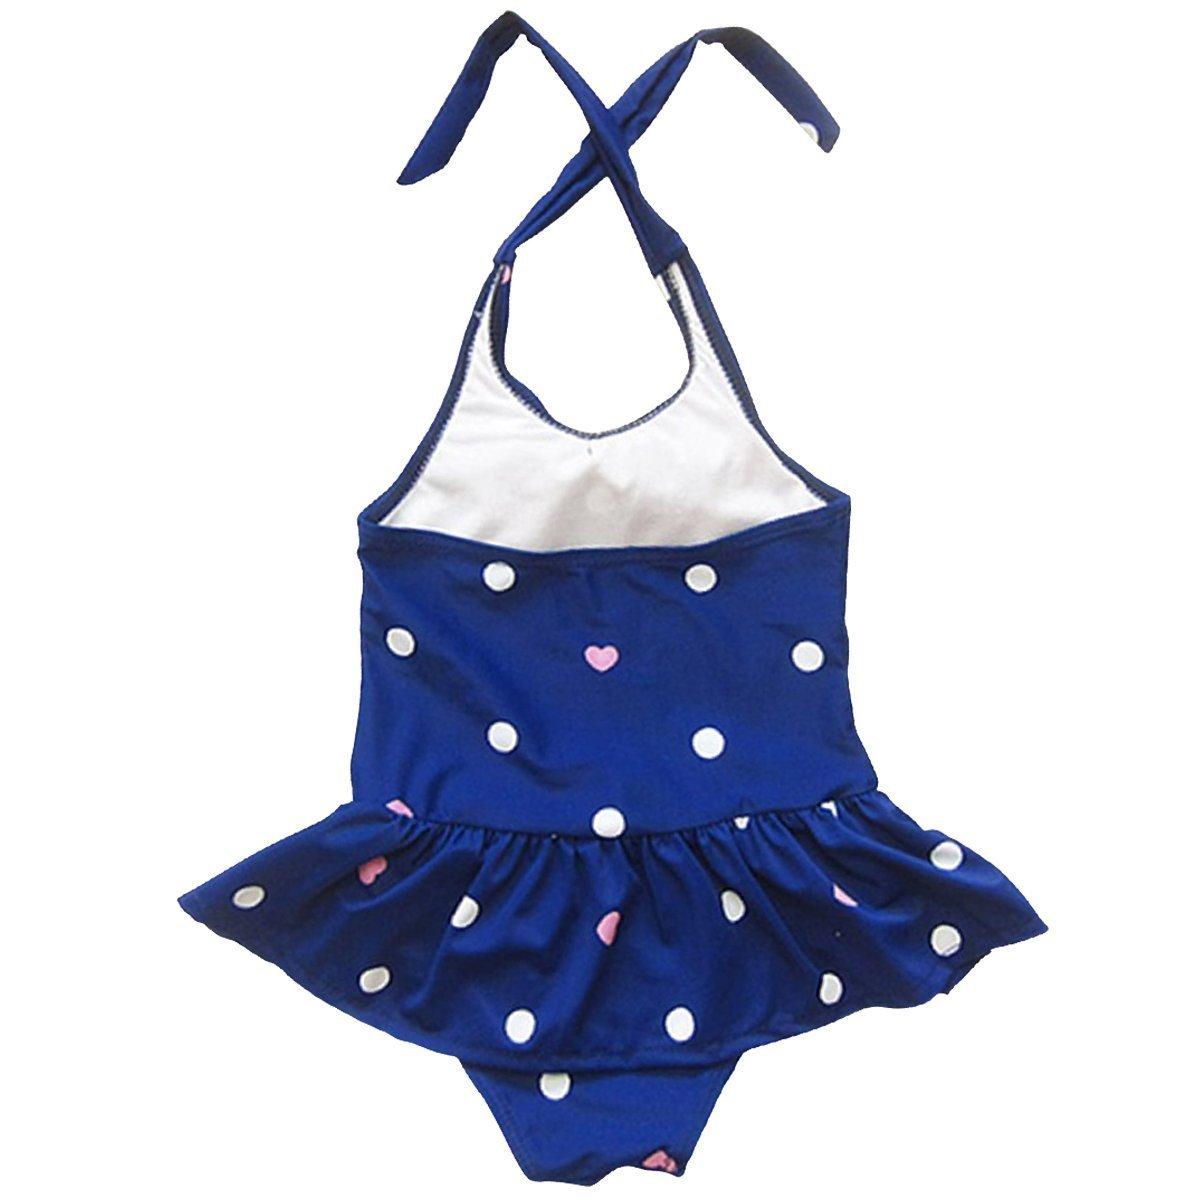 Baby Girls One-piece Swimsuits Dot Printed Beach Wear with Headband